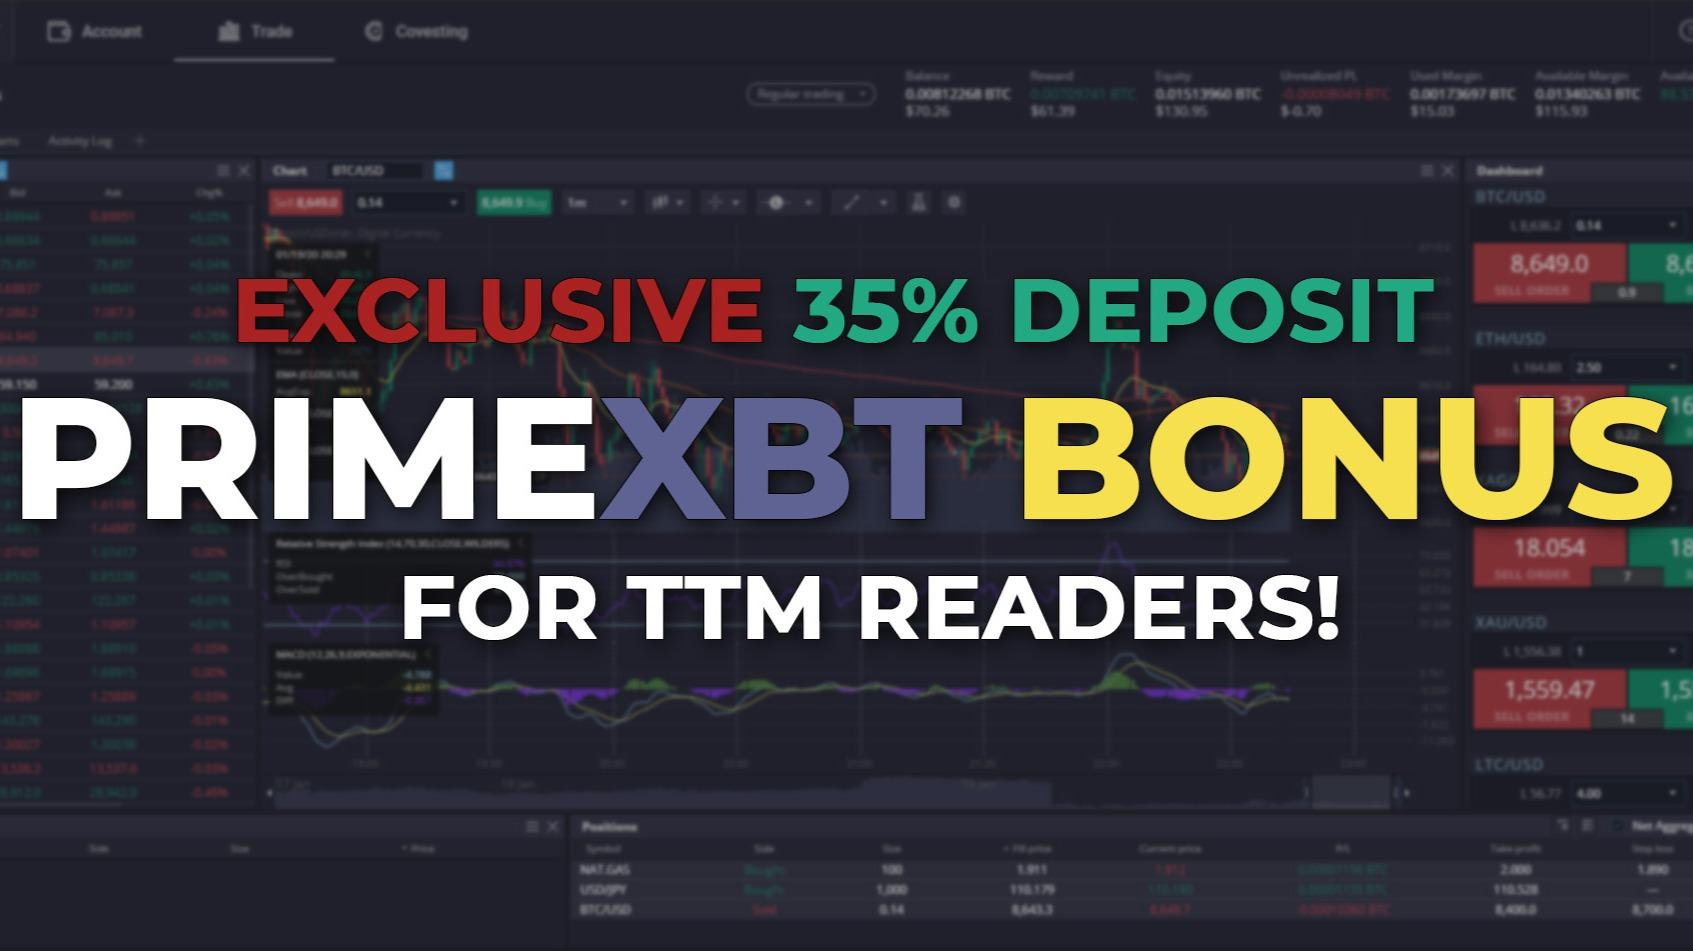 PrimeXBT Bitcoin bonus.